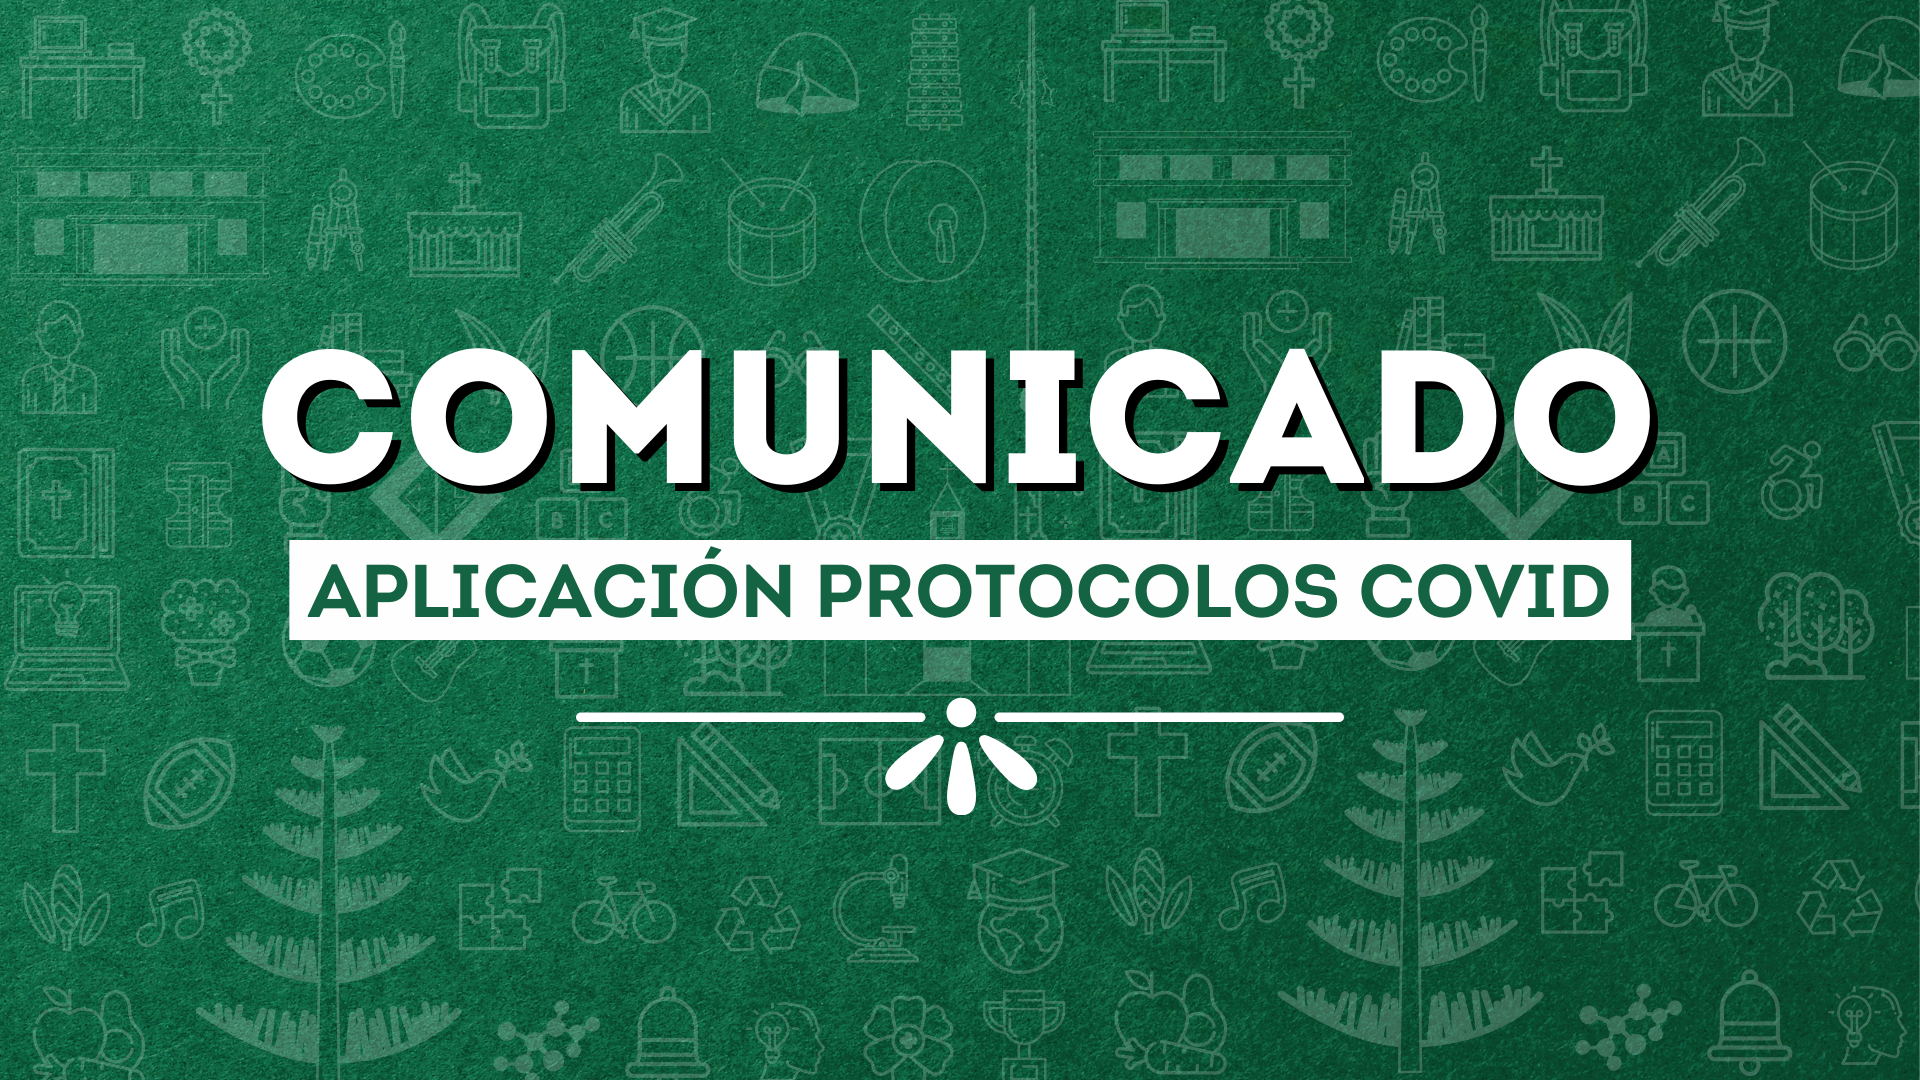 COMUNICADO Nº2 APLICACIÓN PROTOCOLOS COVID-19